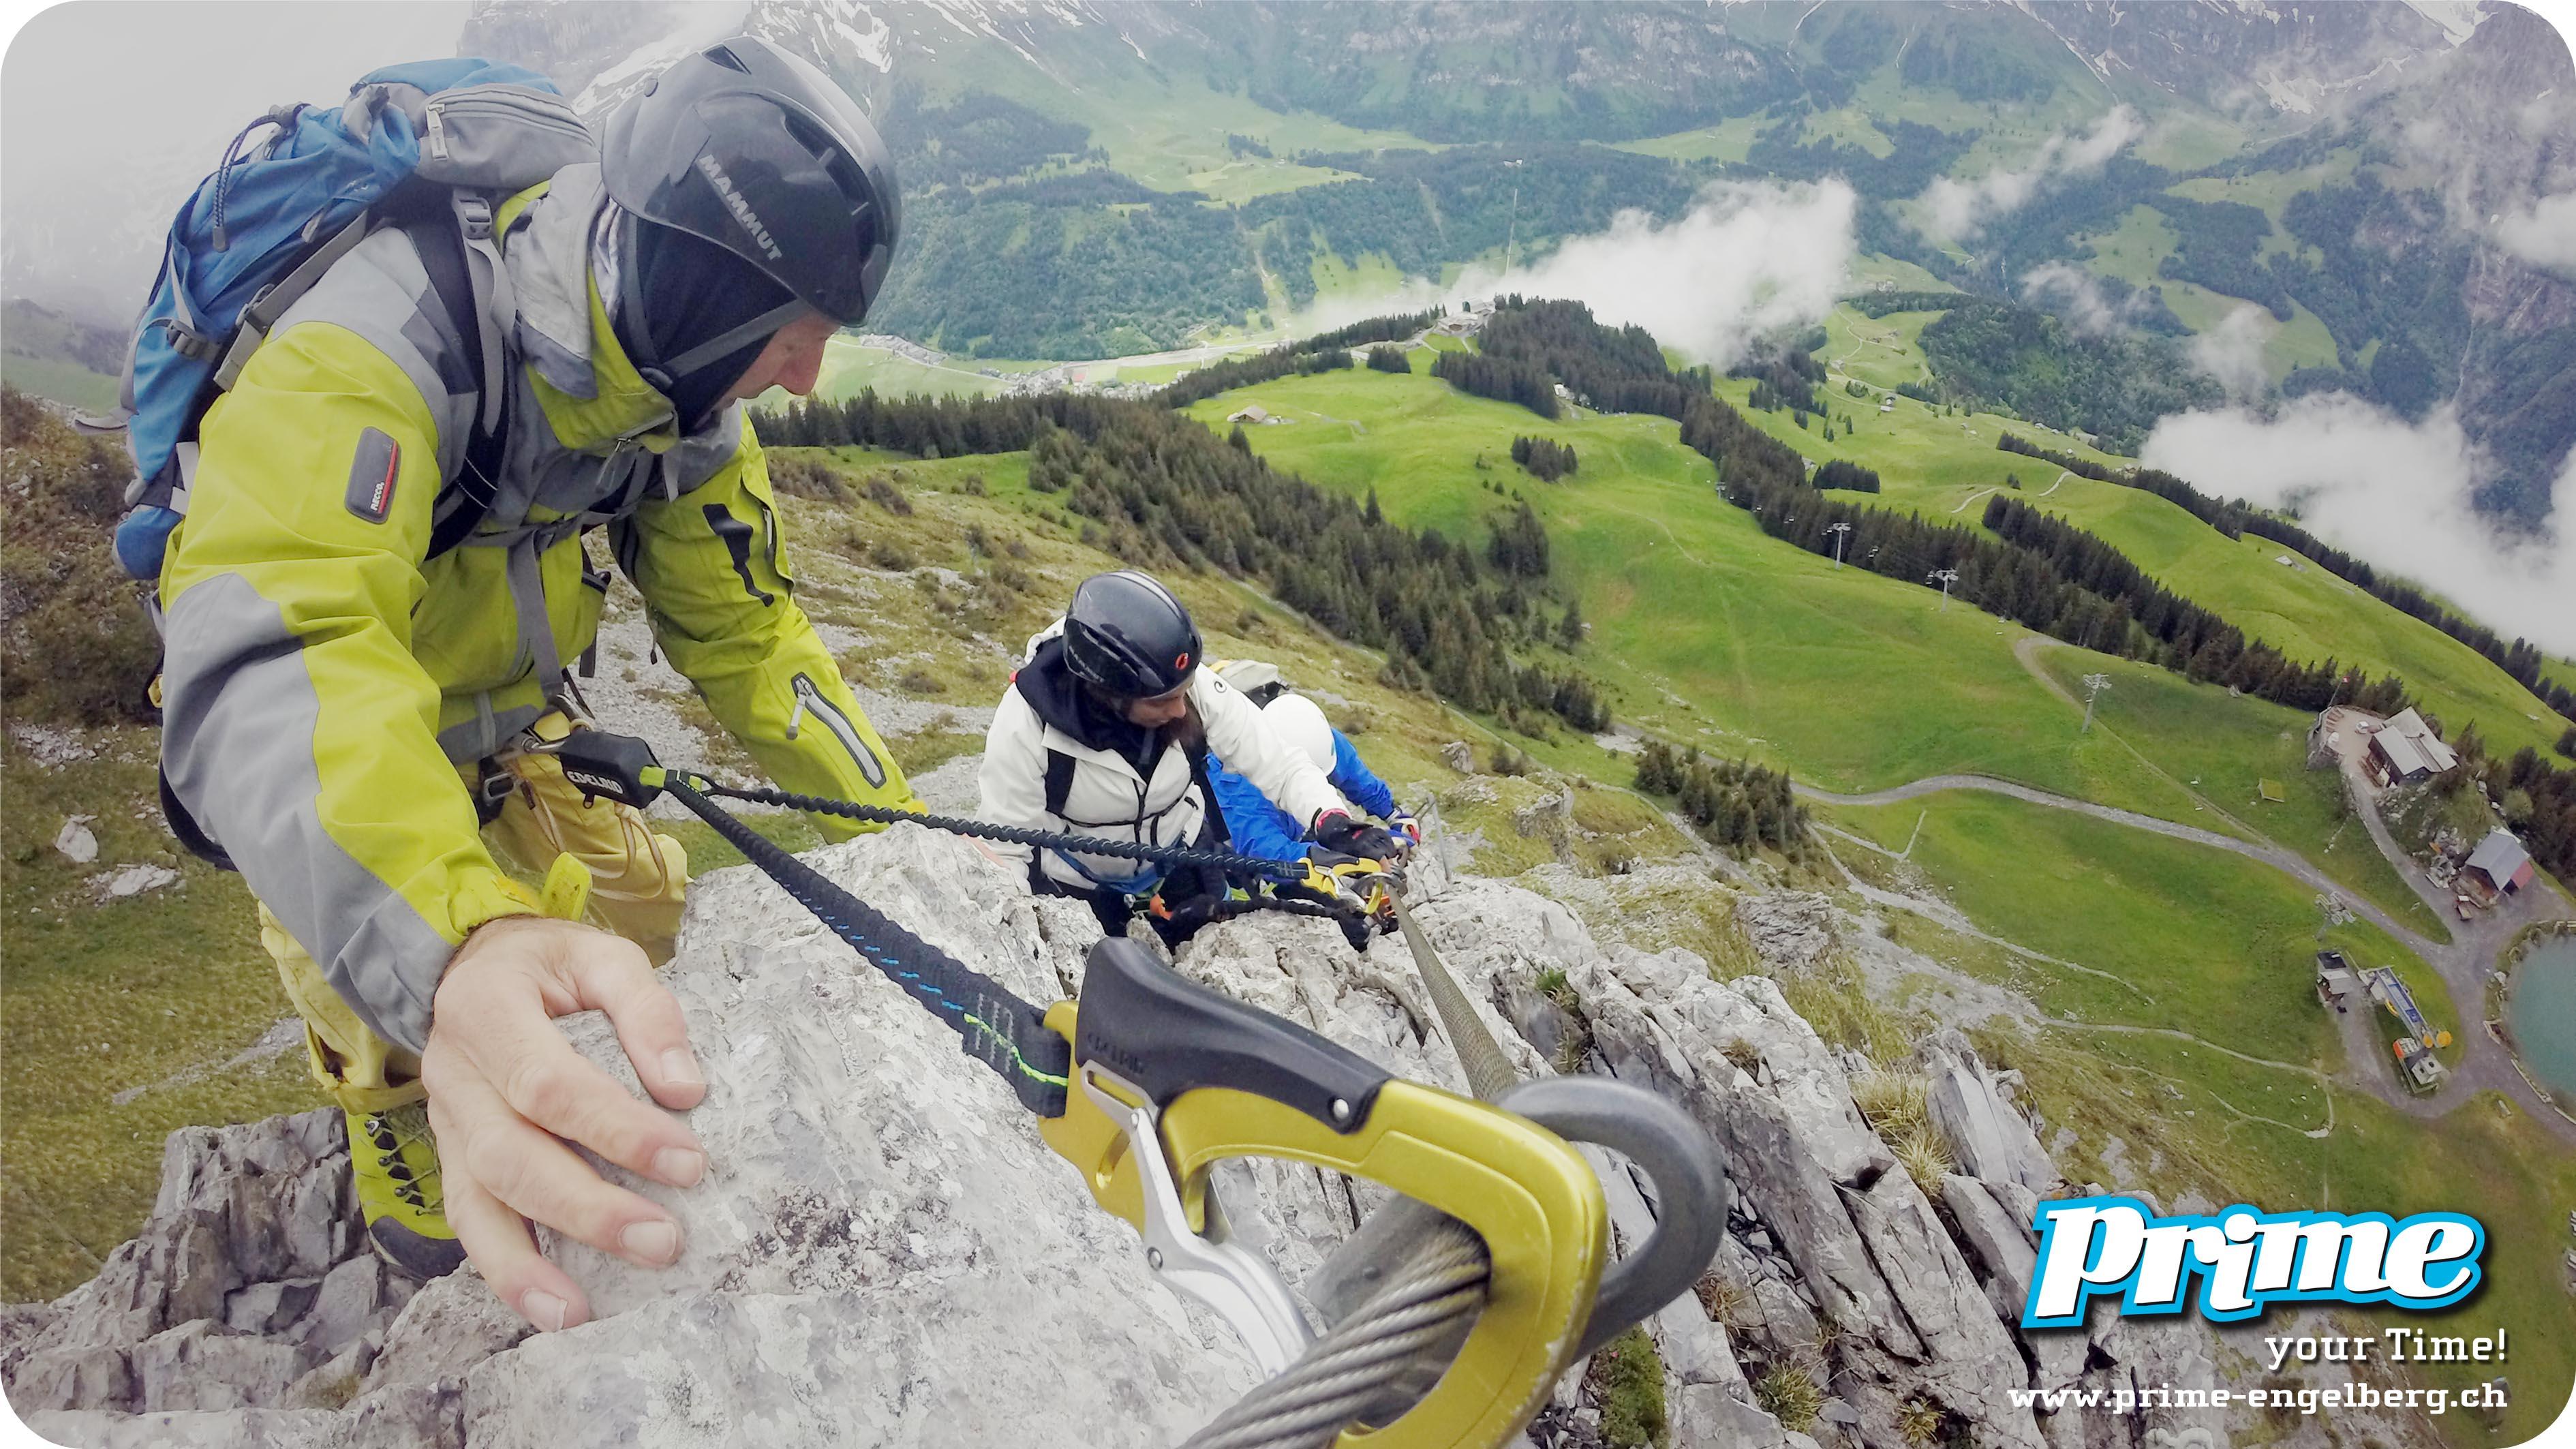 Klettersteig Engelberg : Klettersteig u cbrunnistöckliu d engelberg mountain guide